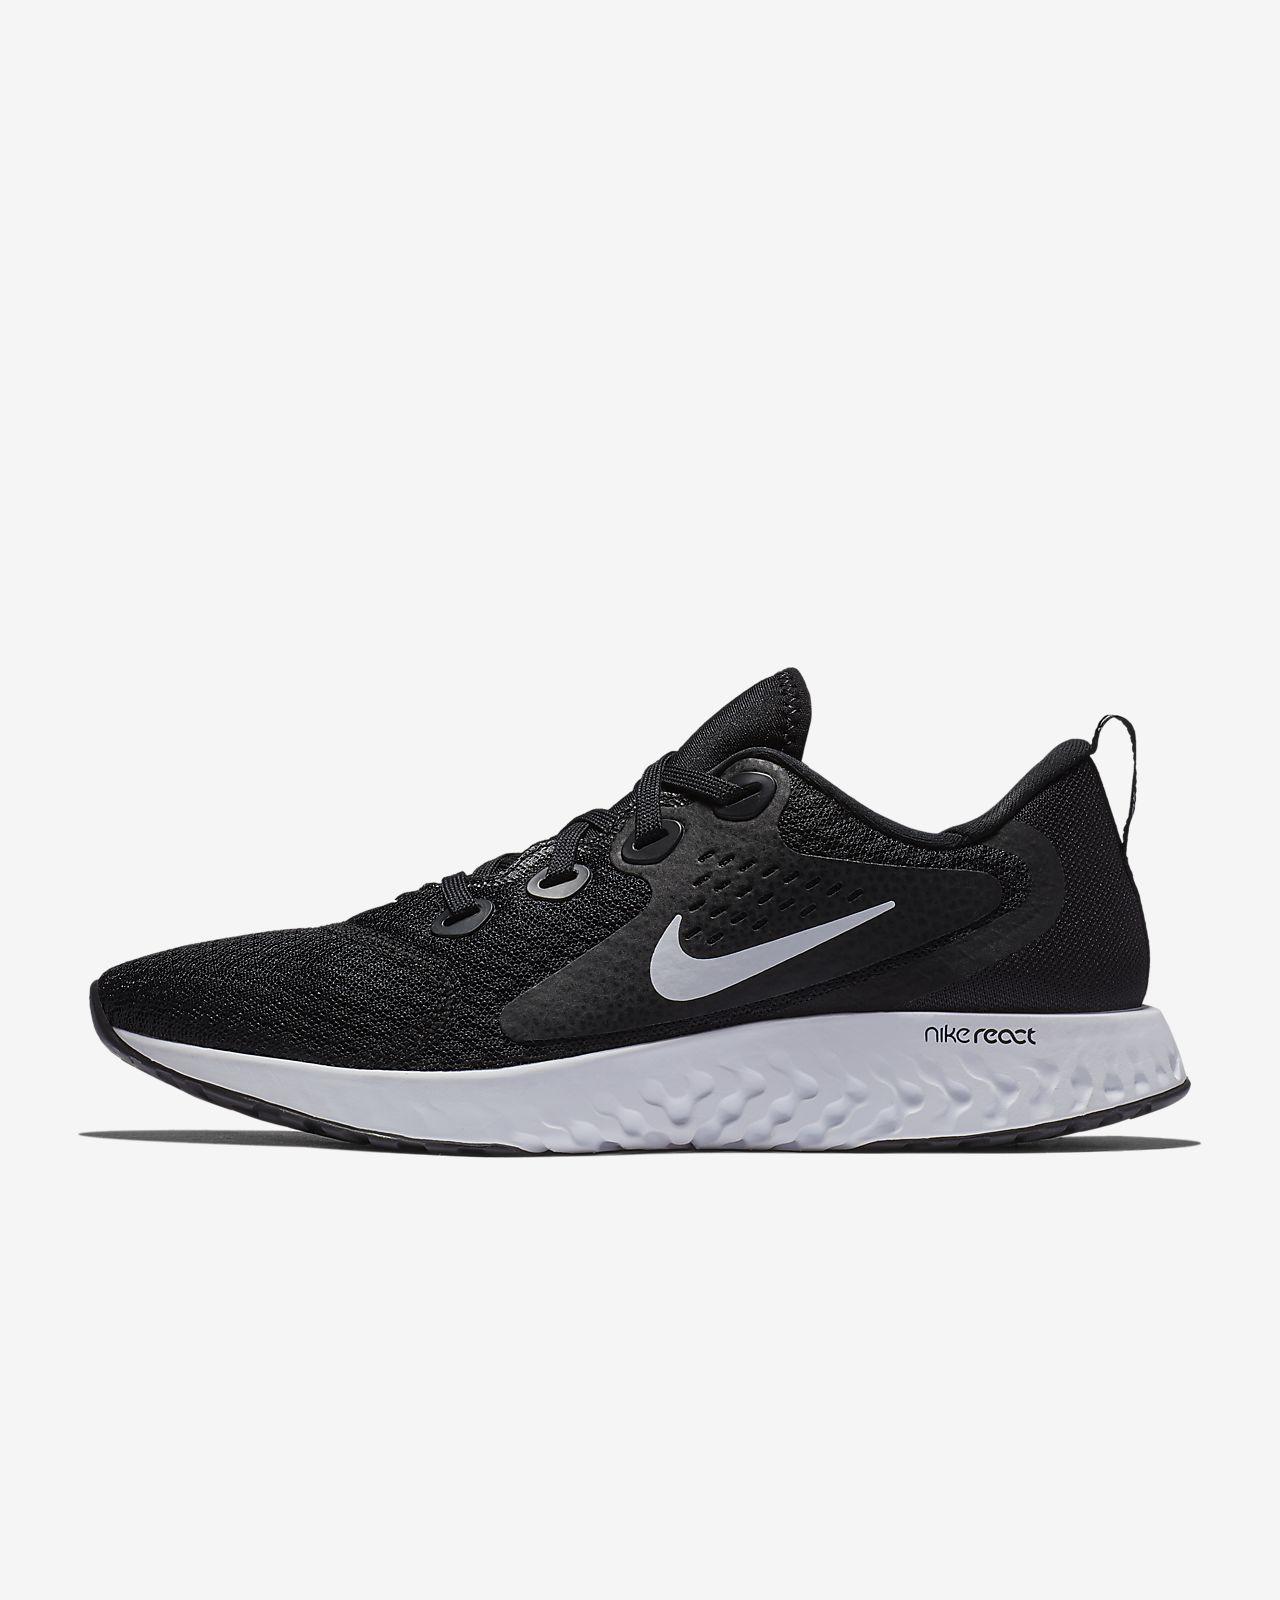 san francisco 1a585 0a2af ... Chaussure de running Nike Legend React pour Femme